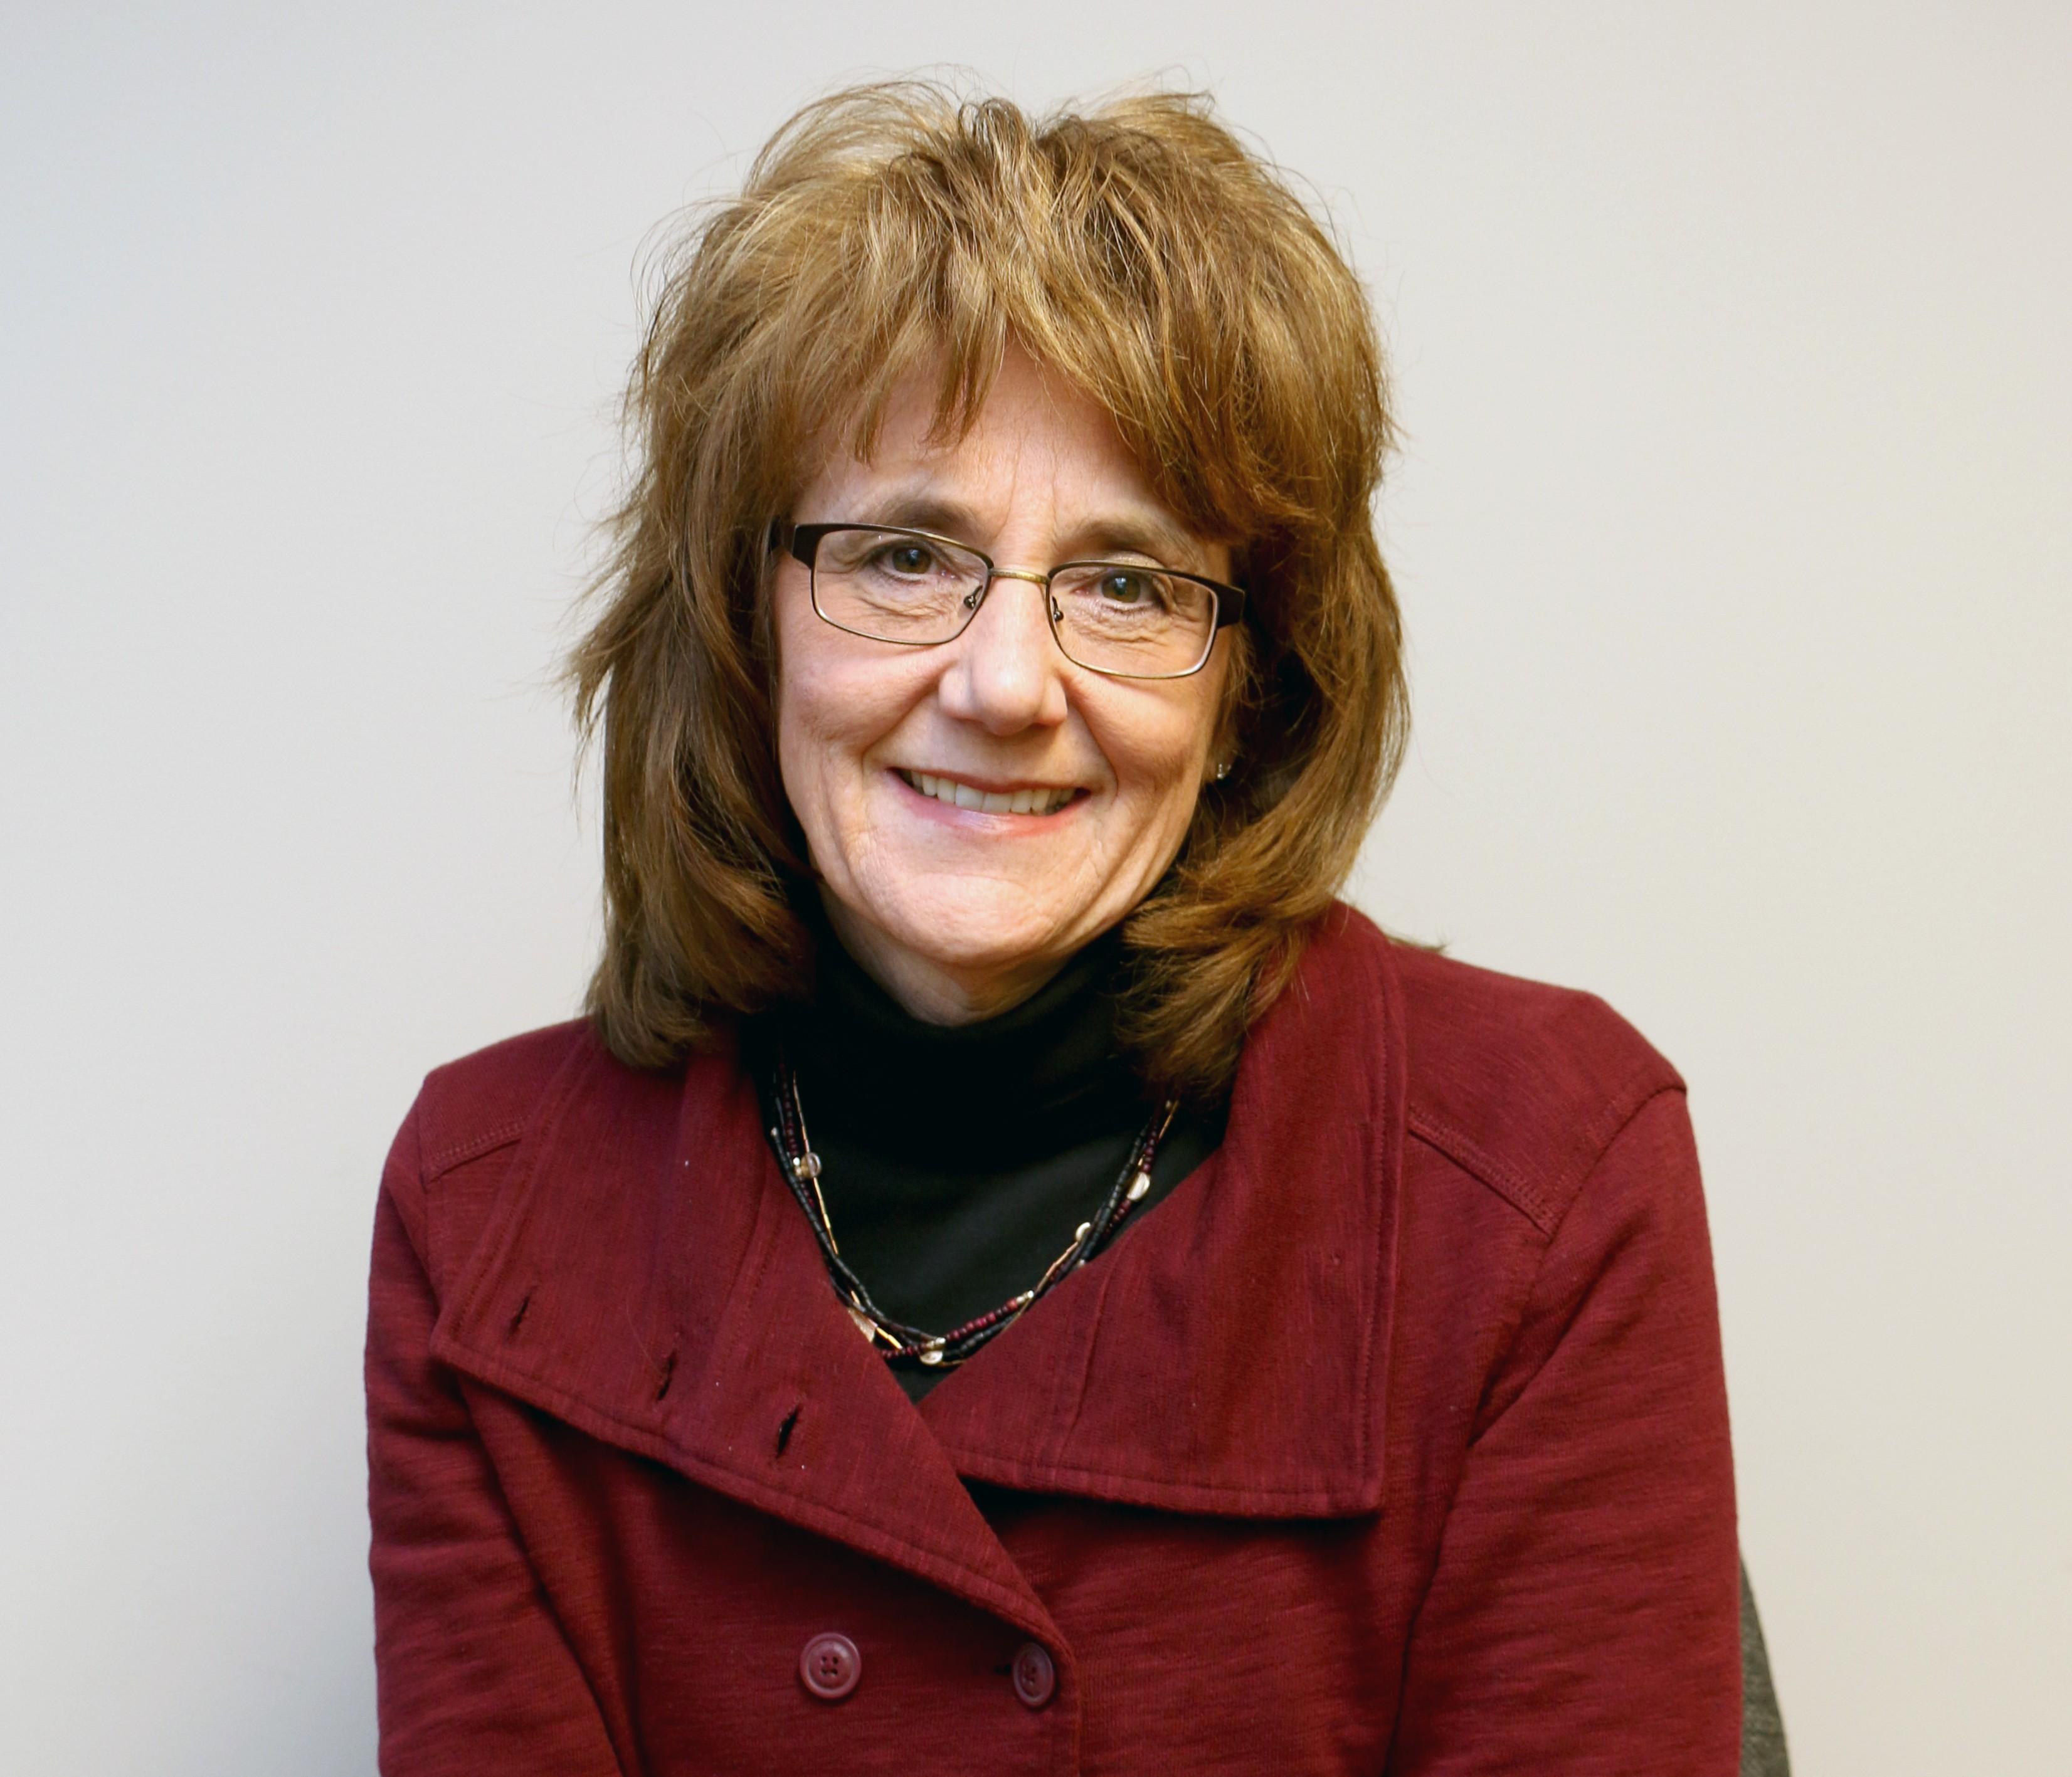 Deb Kluck